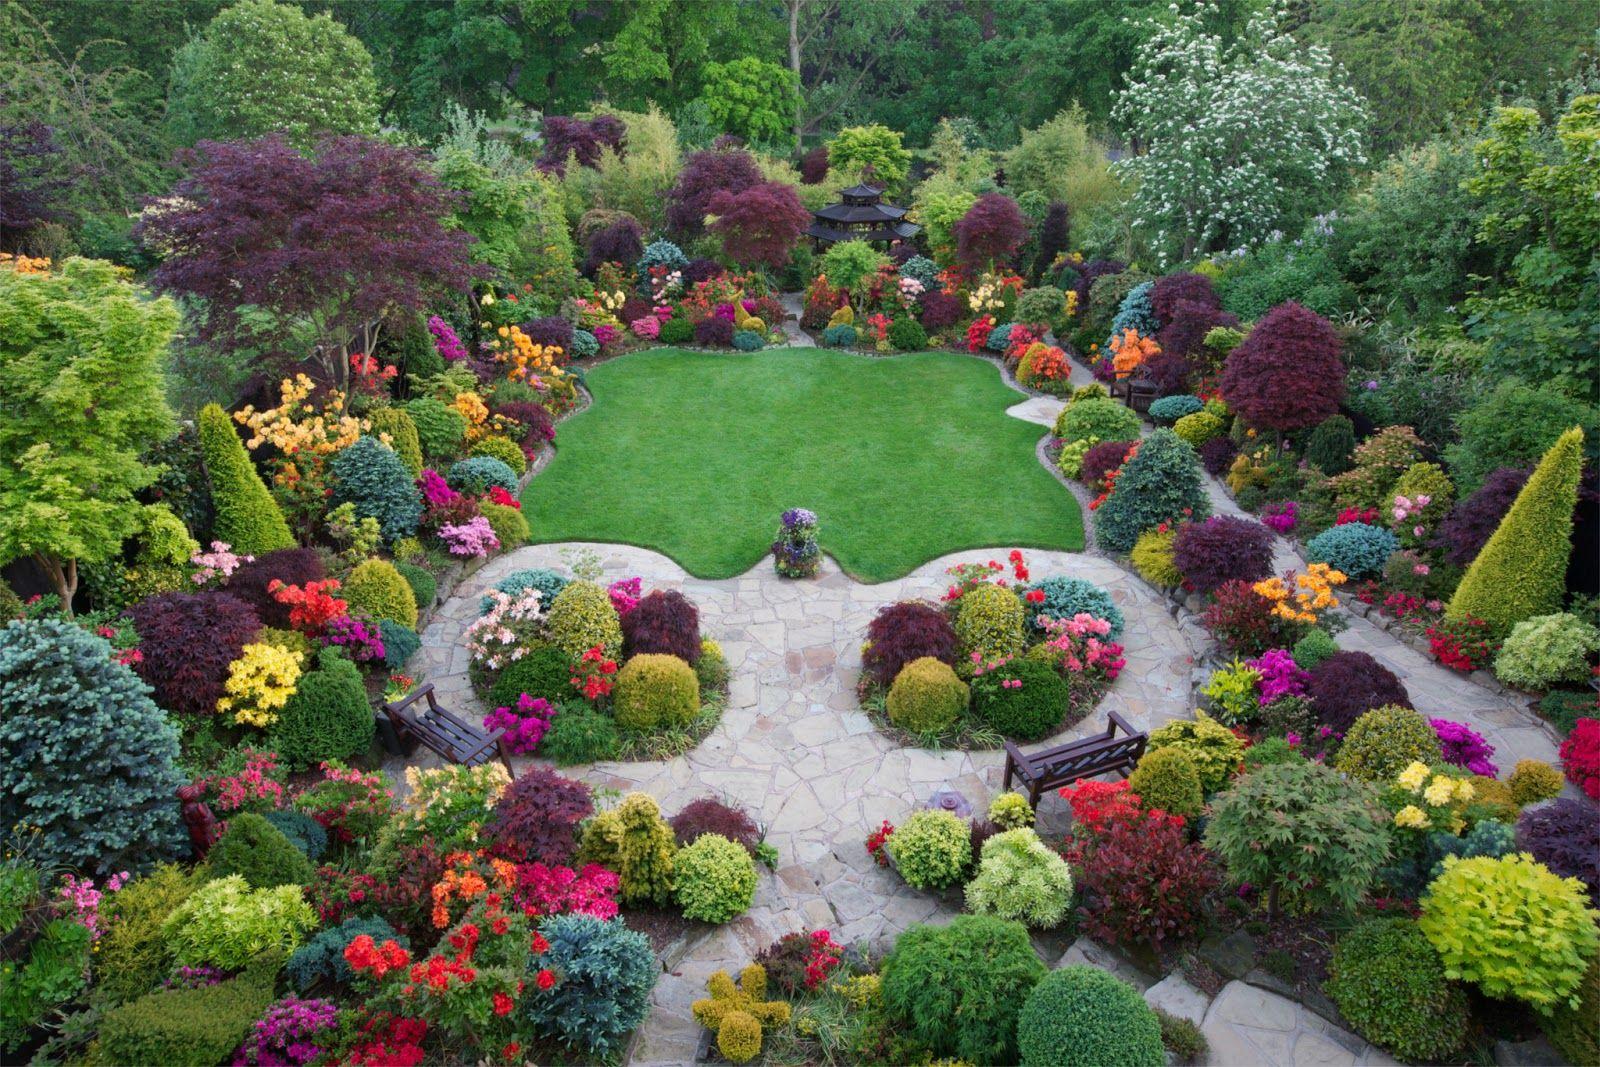 Kvtina Haters Beautiful Home Gardens Amazing Gardens